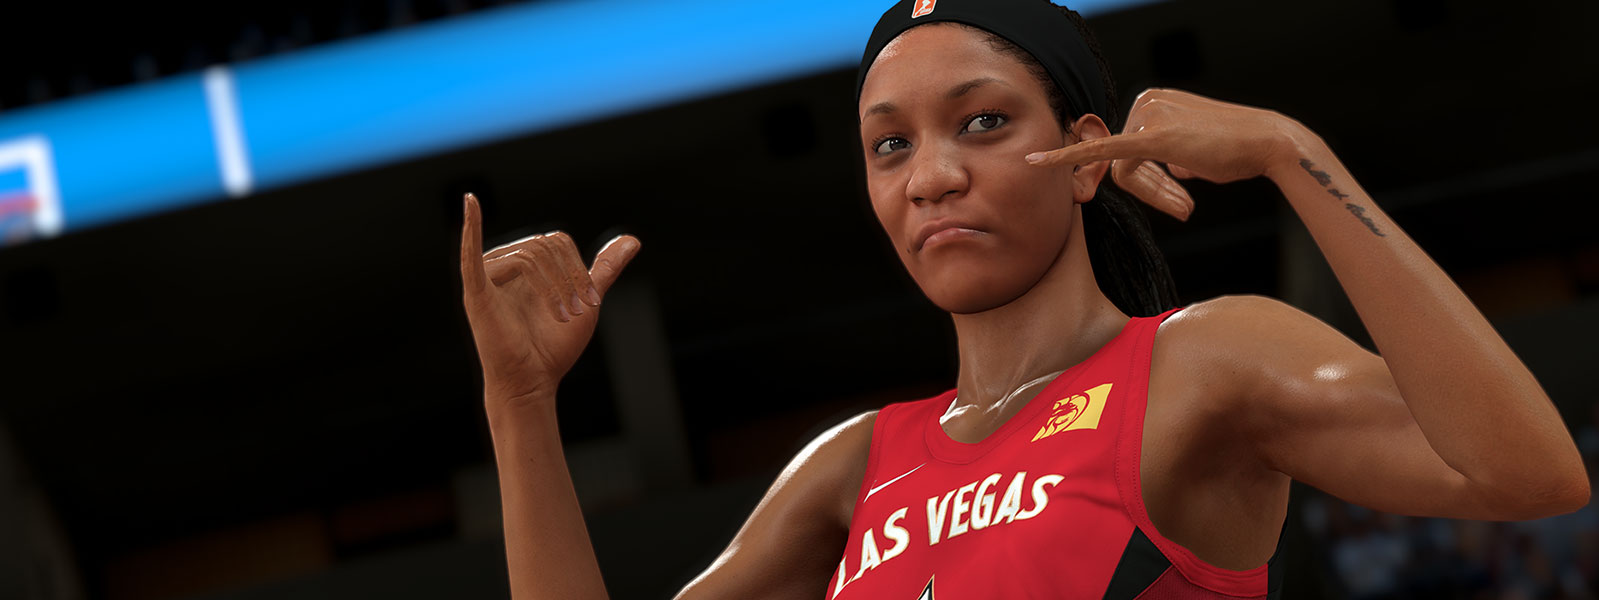 Posierender Las Vegas WNBA-Spieler